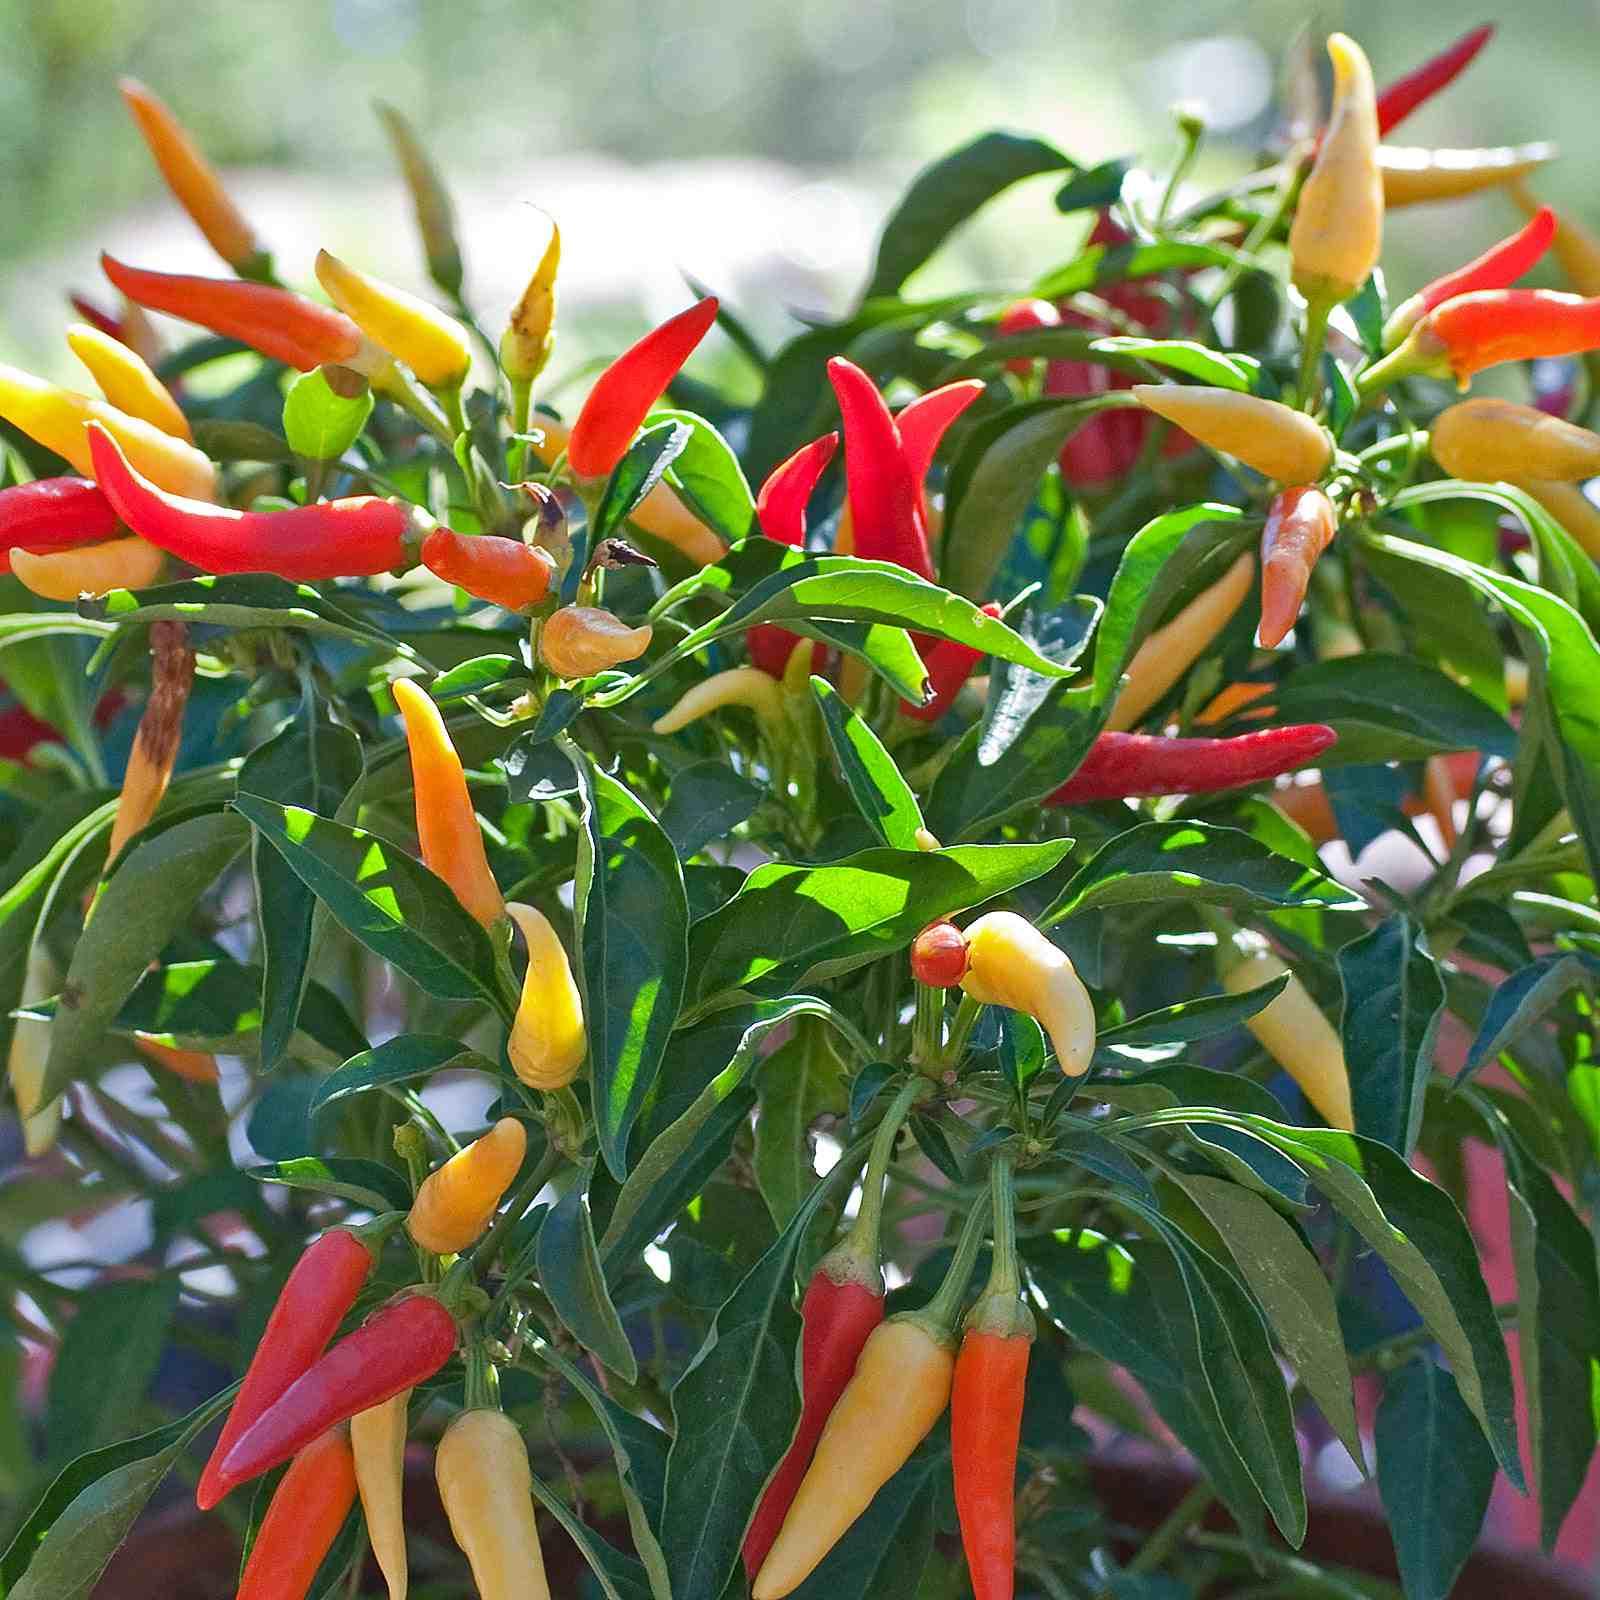 Growing ornamental hot peppers